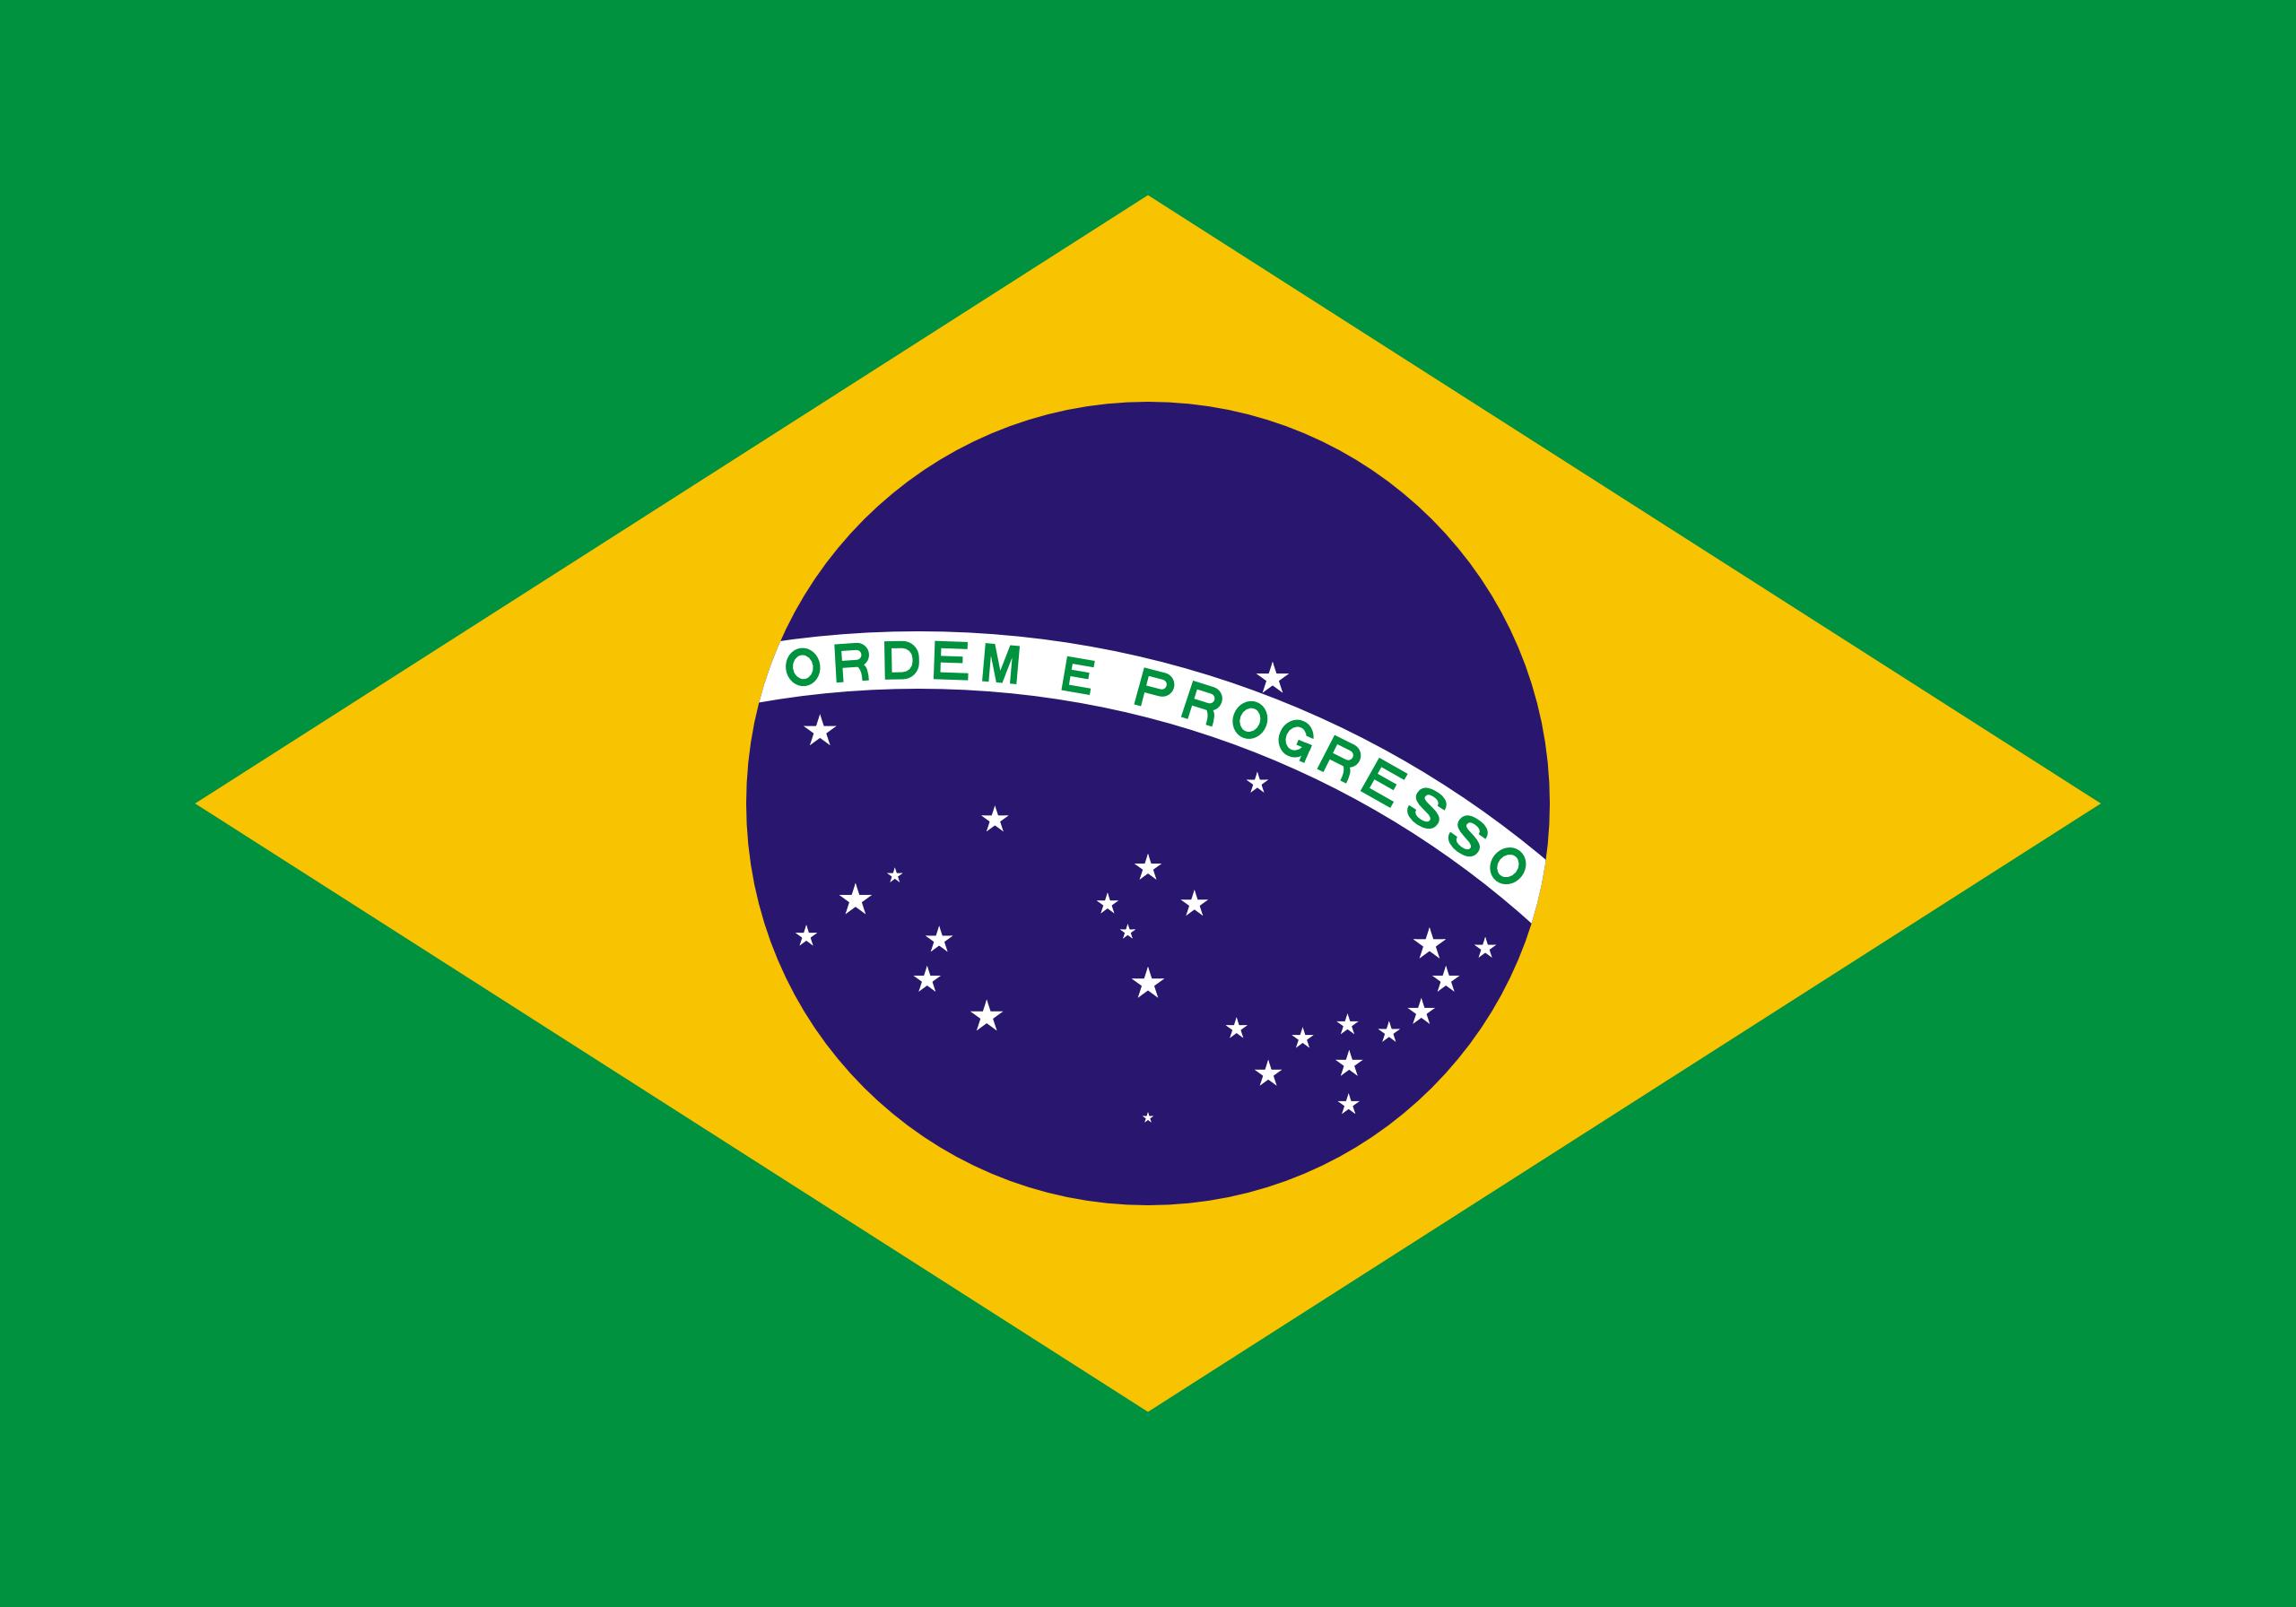 Brasile, paese, emblema, logo, simbolo - Sfondi HD - Professor-falken.com